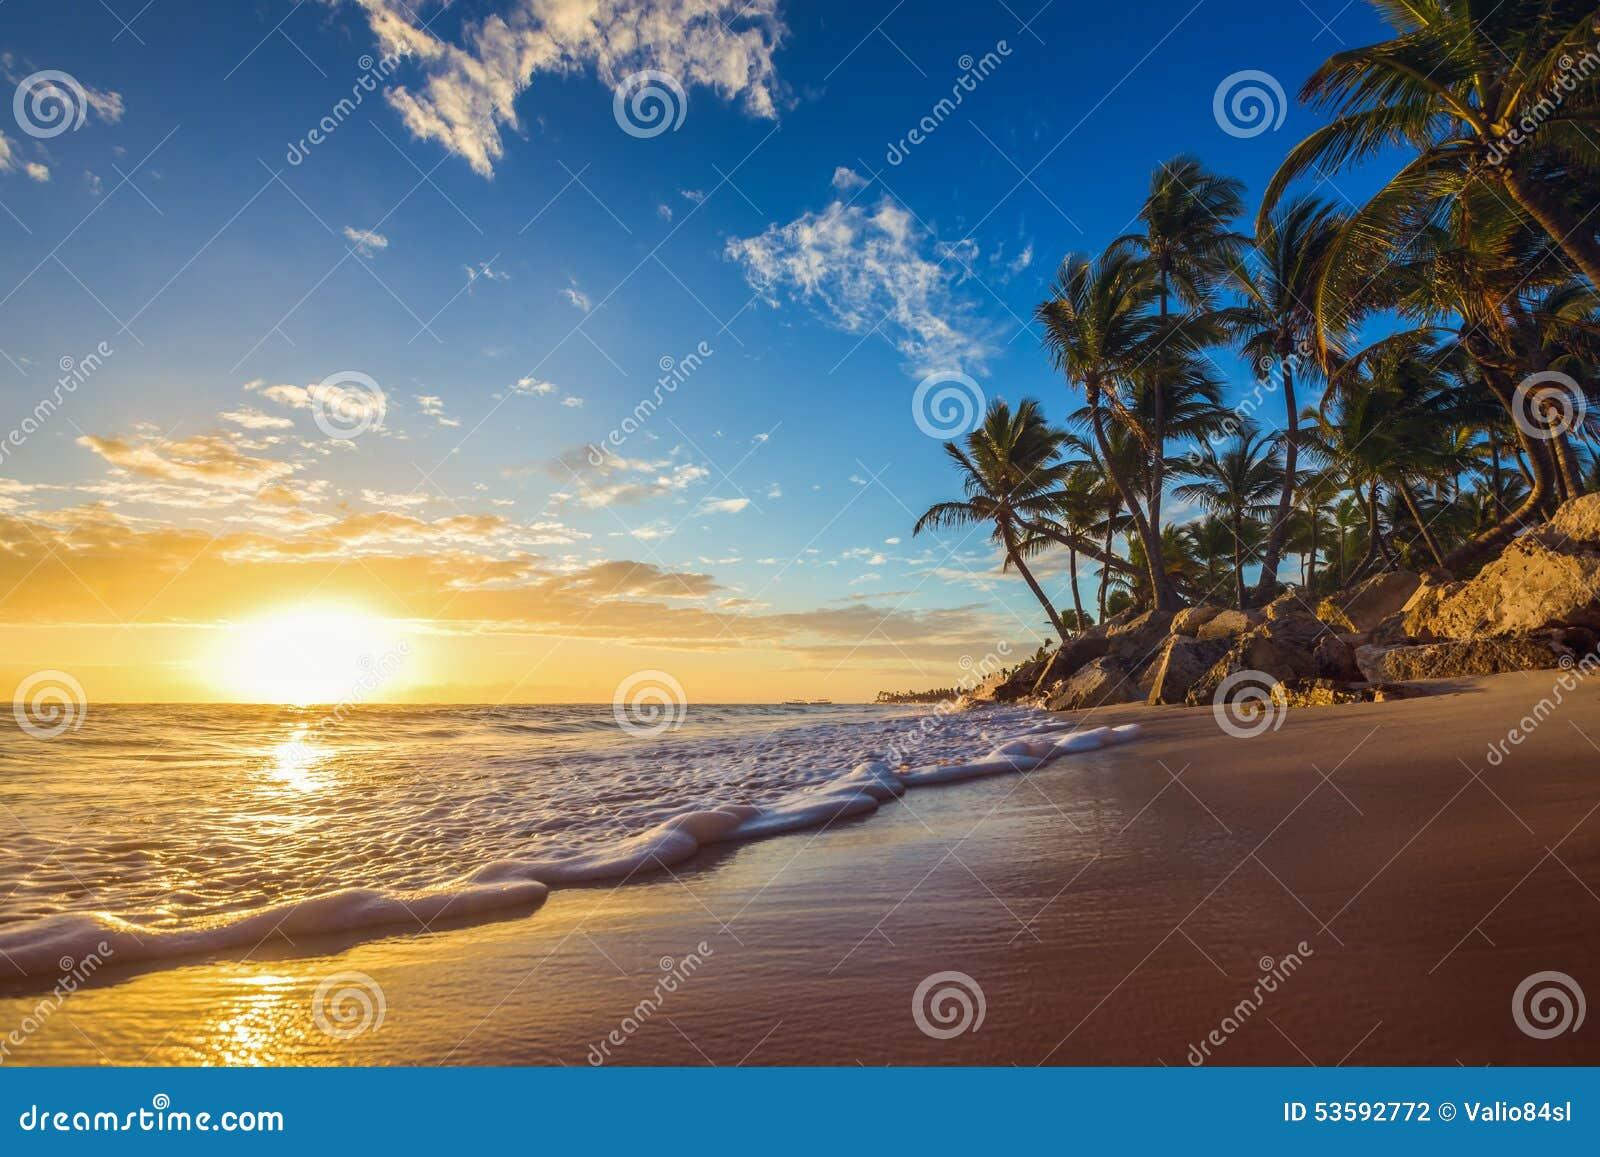 Landschaft des Paradiestropeninselstrandes, Sonnenaufgangschuß